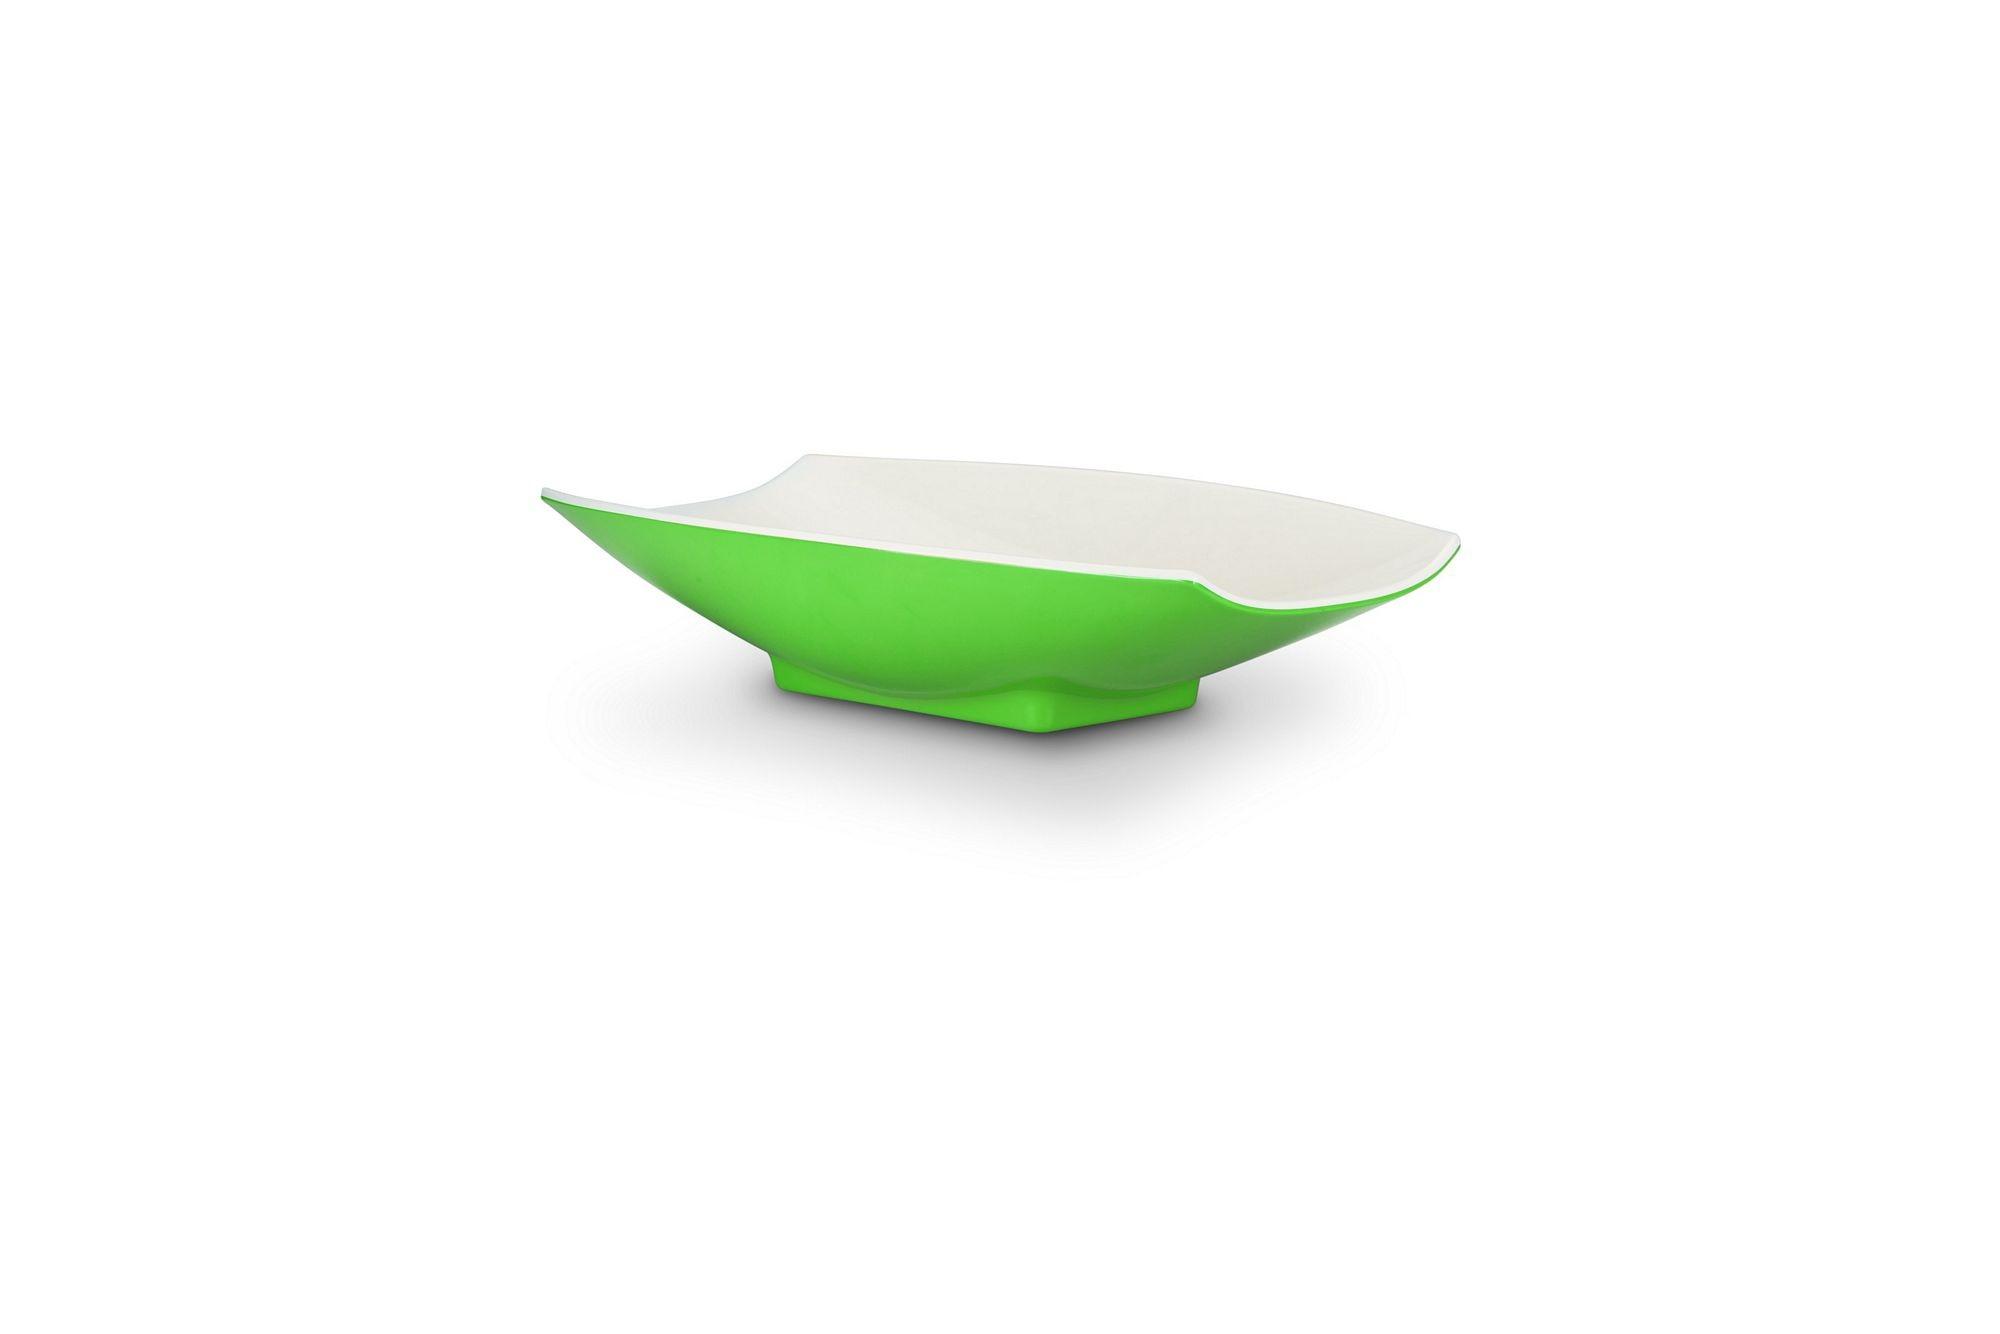 Bon Chef 53702-2ToneLime Melamine Curves Bowl, Lime Outside/White Inside 24 oz.